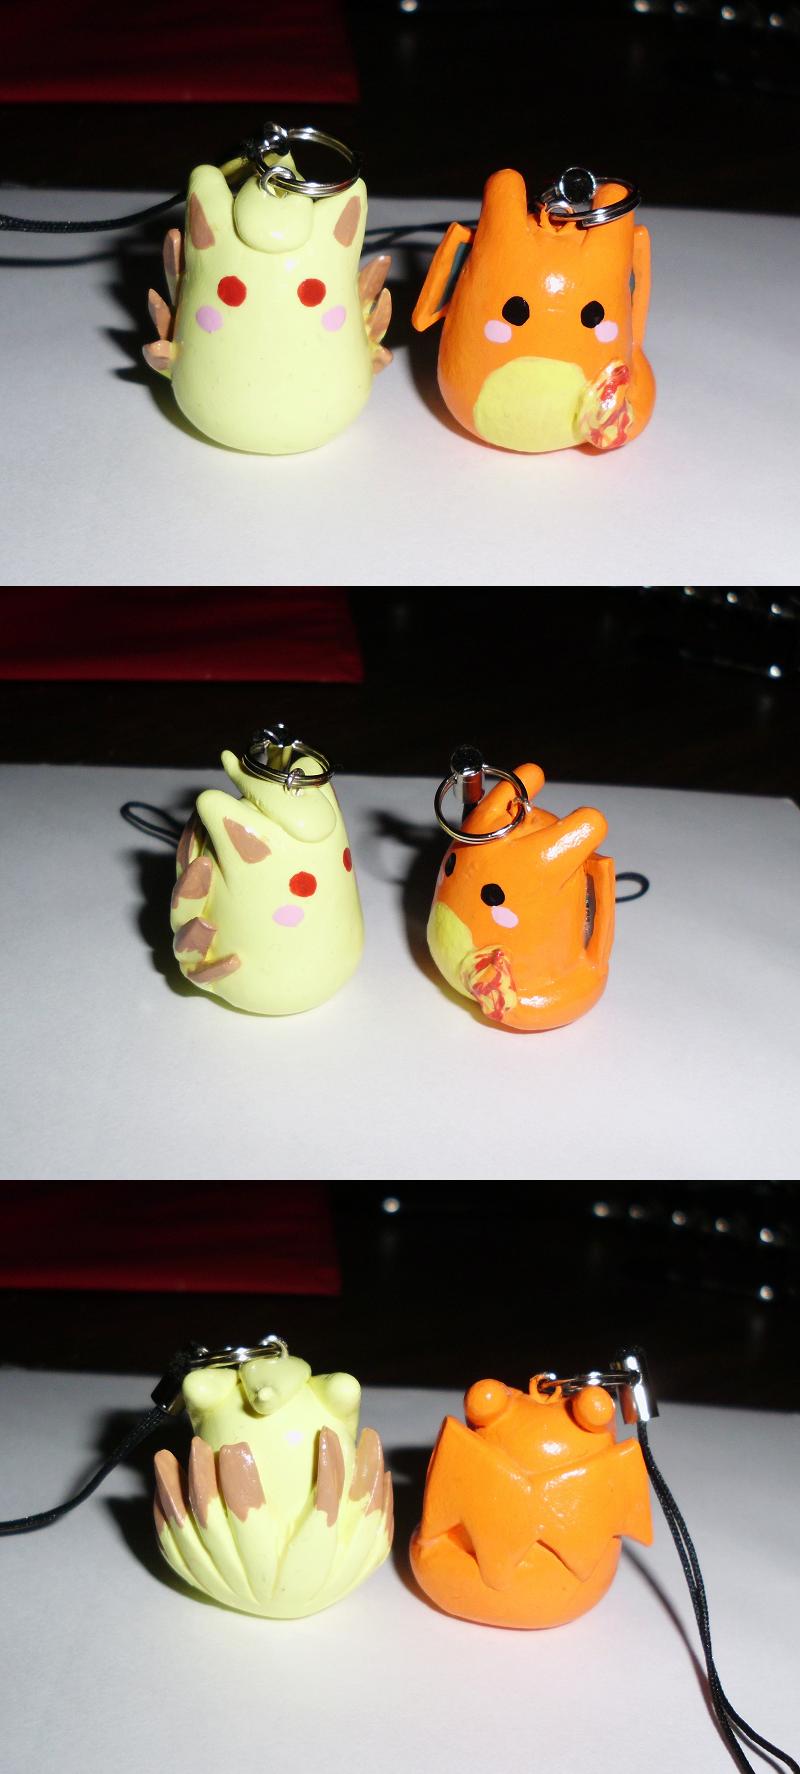 Poke-Peeps Cellphone Charm - Ninetales + Charizard by UniqueTreats